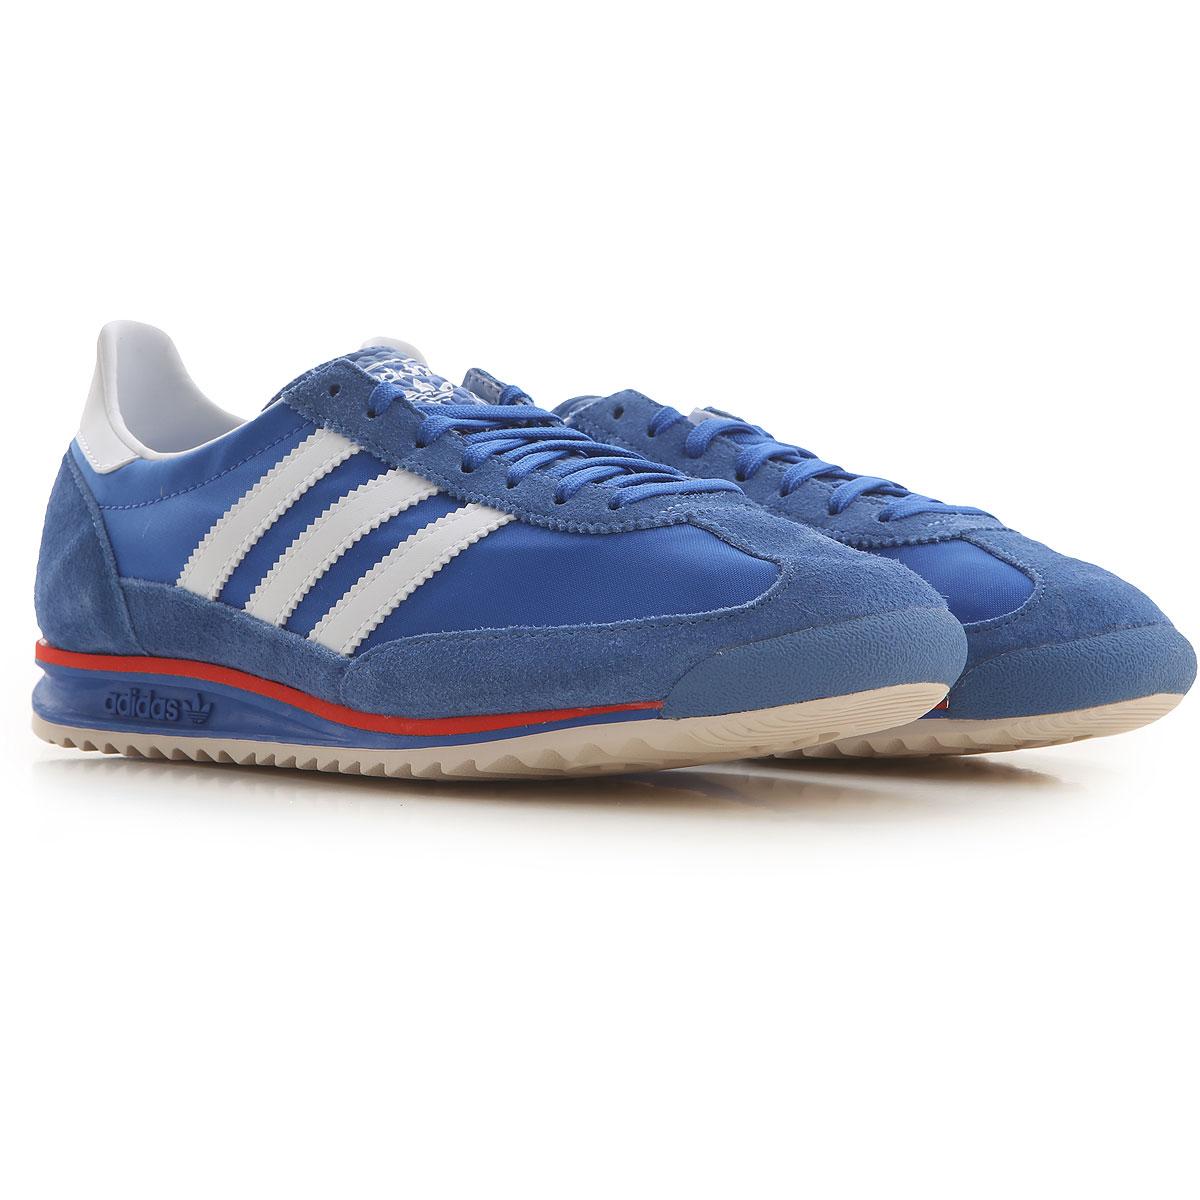 Adidas Sneakers for Men On Sale, Bluette, Synthetic Suede, 2019, US 9.5 - UK 9 - EU 43.5 US 8 - UK 7.5 - EU 41.5